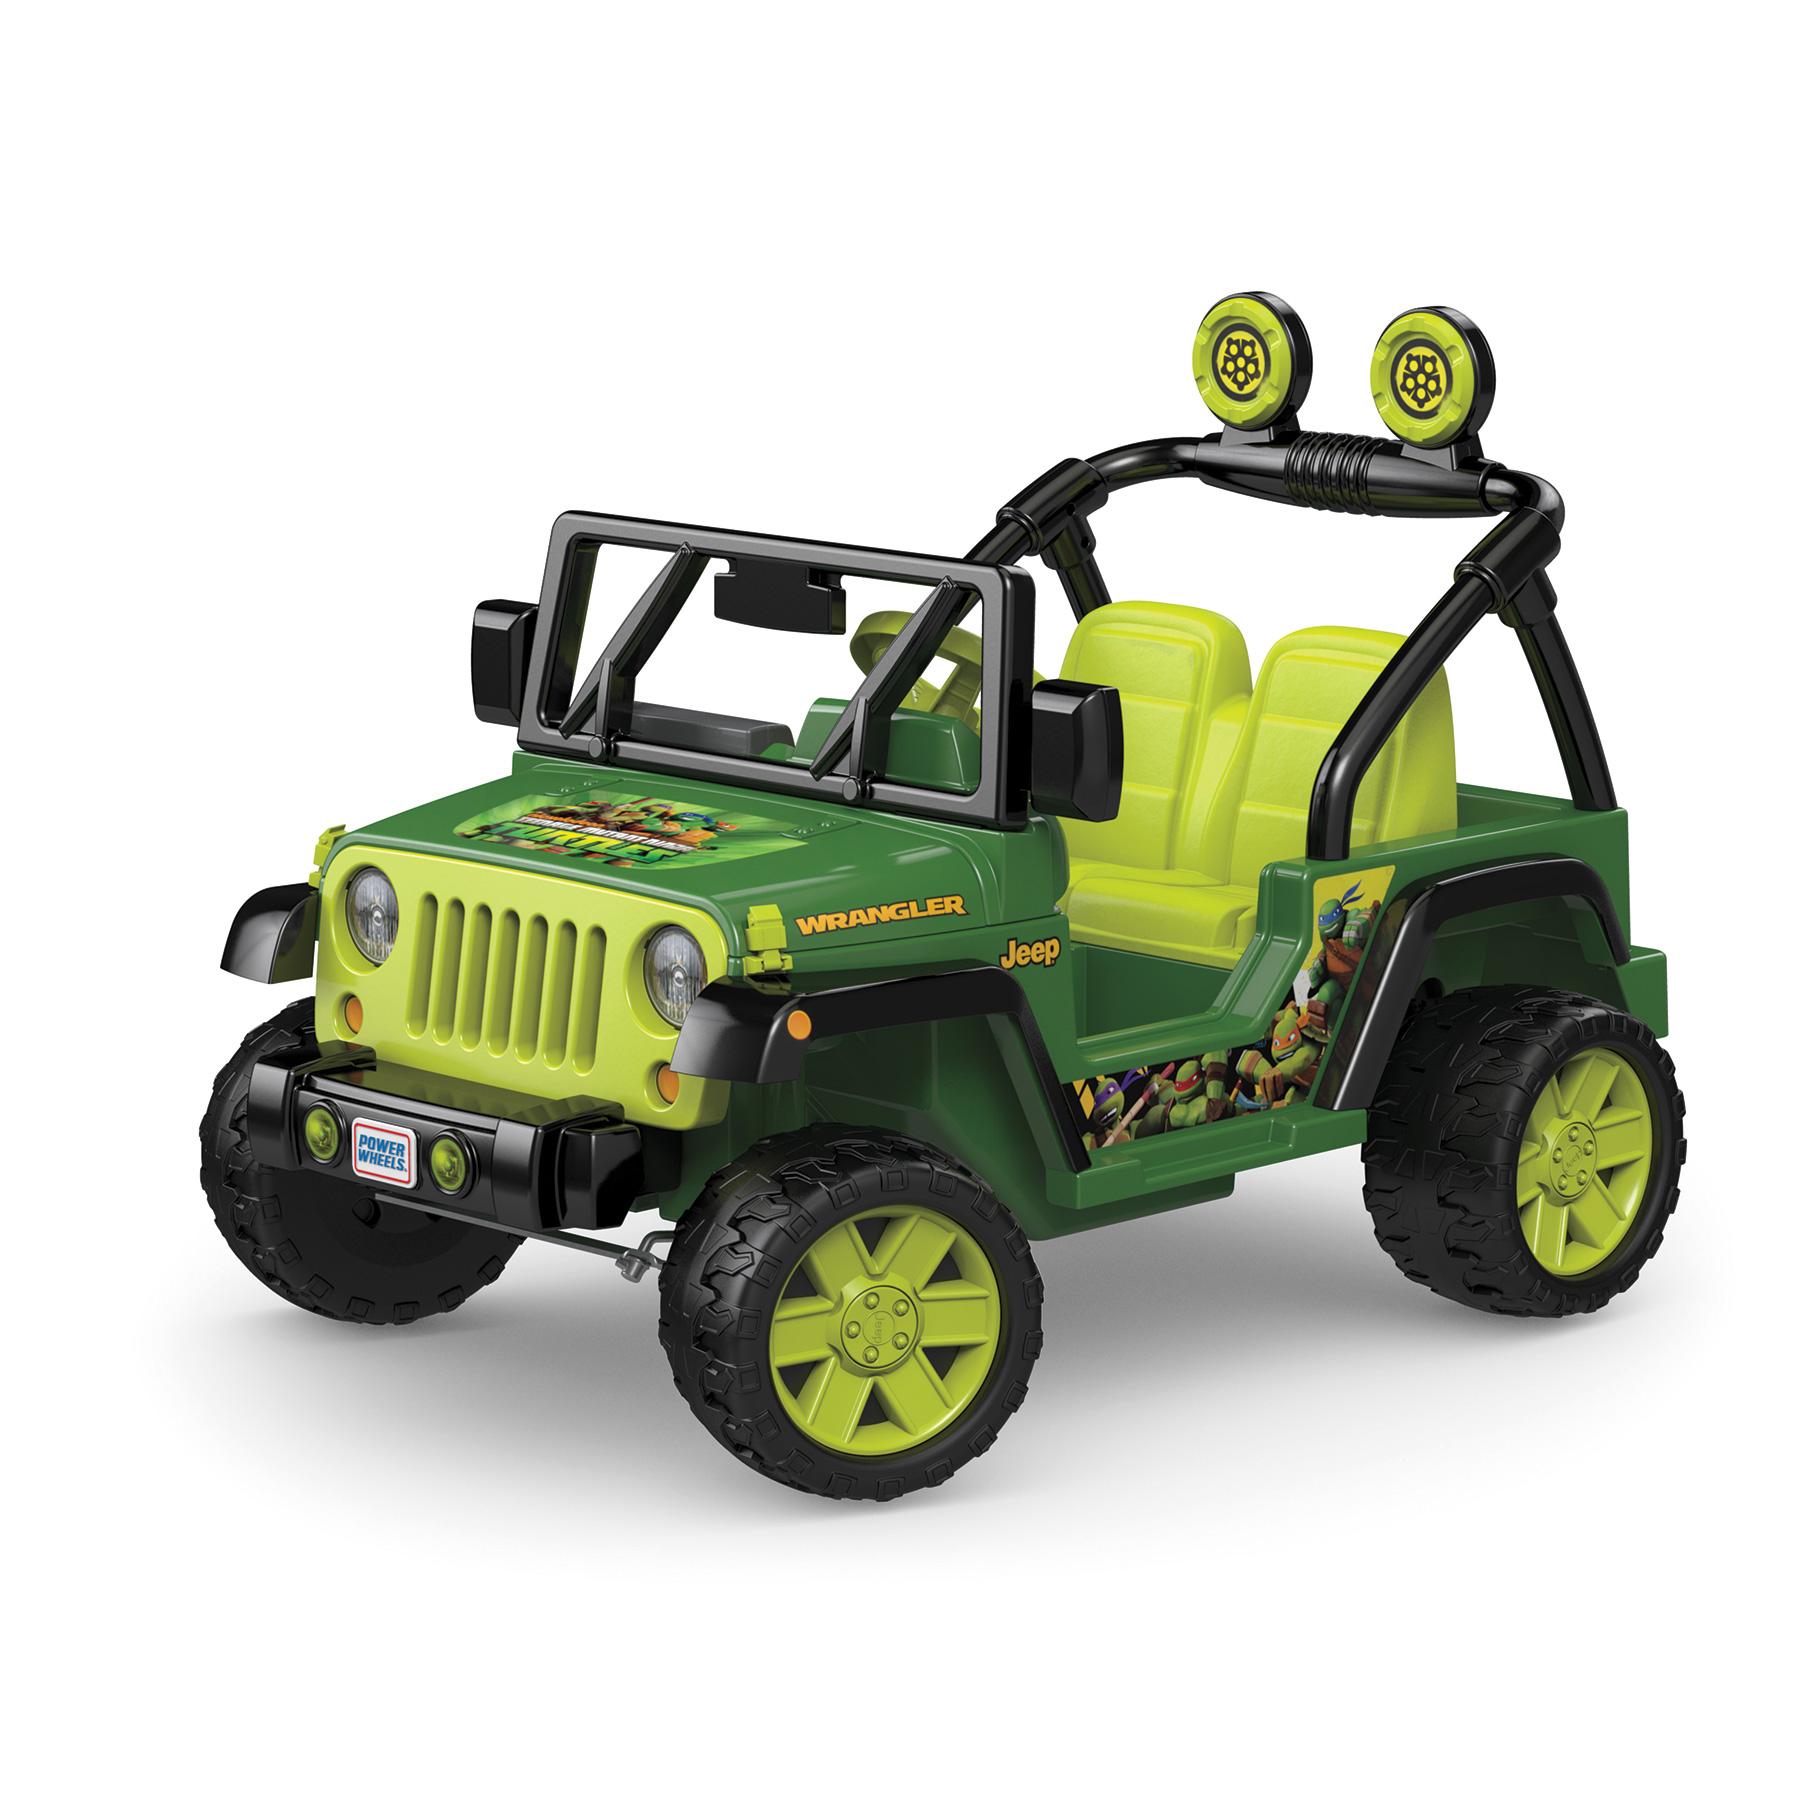 Power Wheels 12v Battery Toy Ride- -teenage Mutant Ninja Turtles Jeep Wrangler